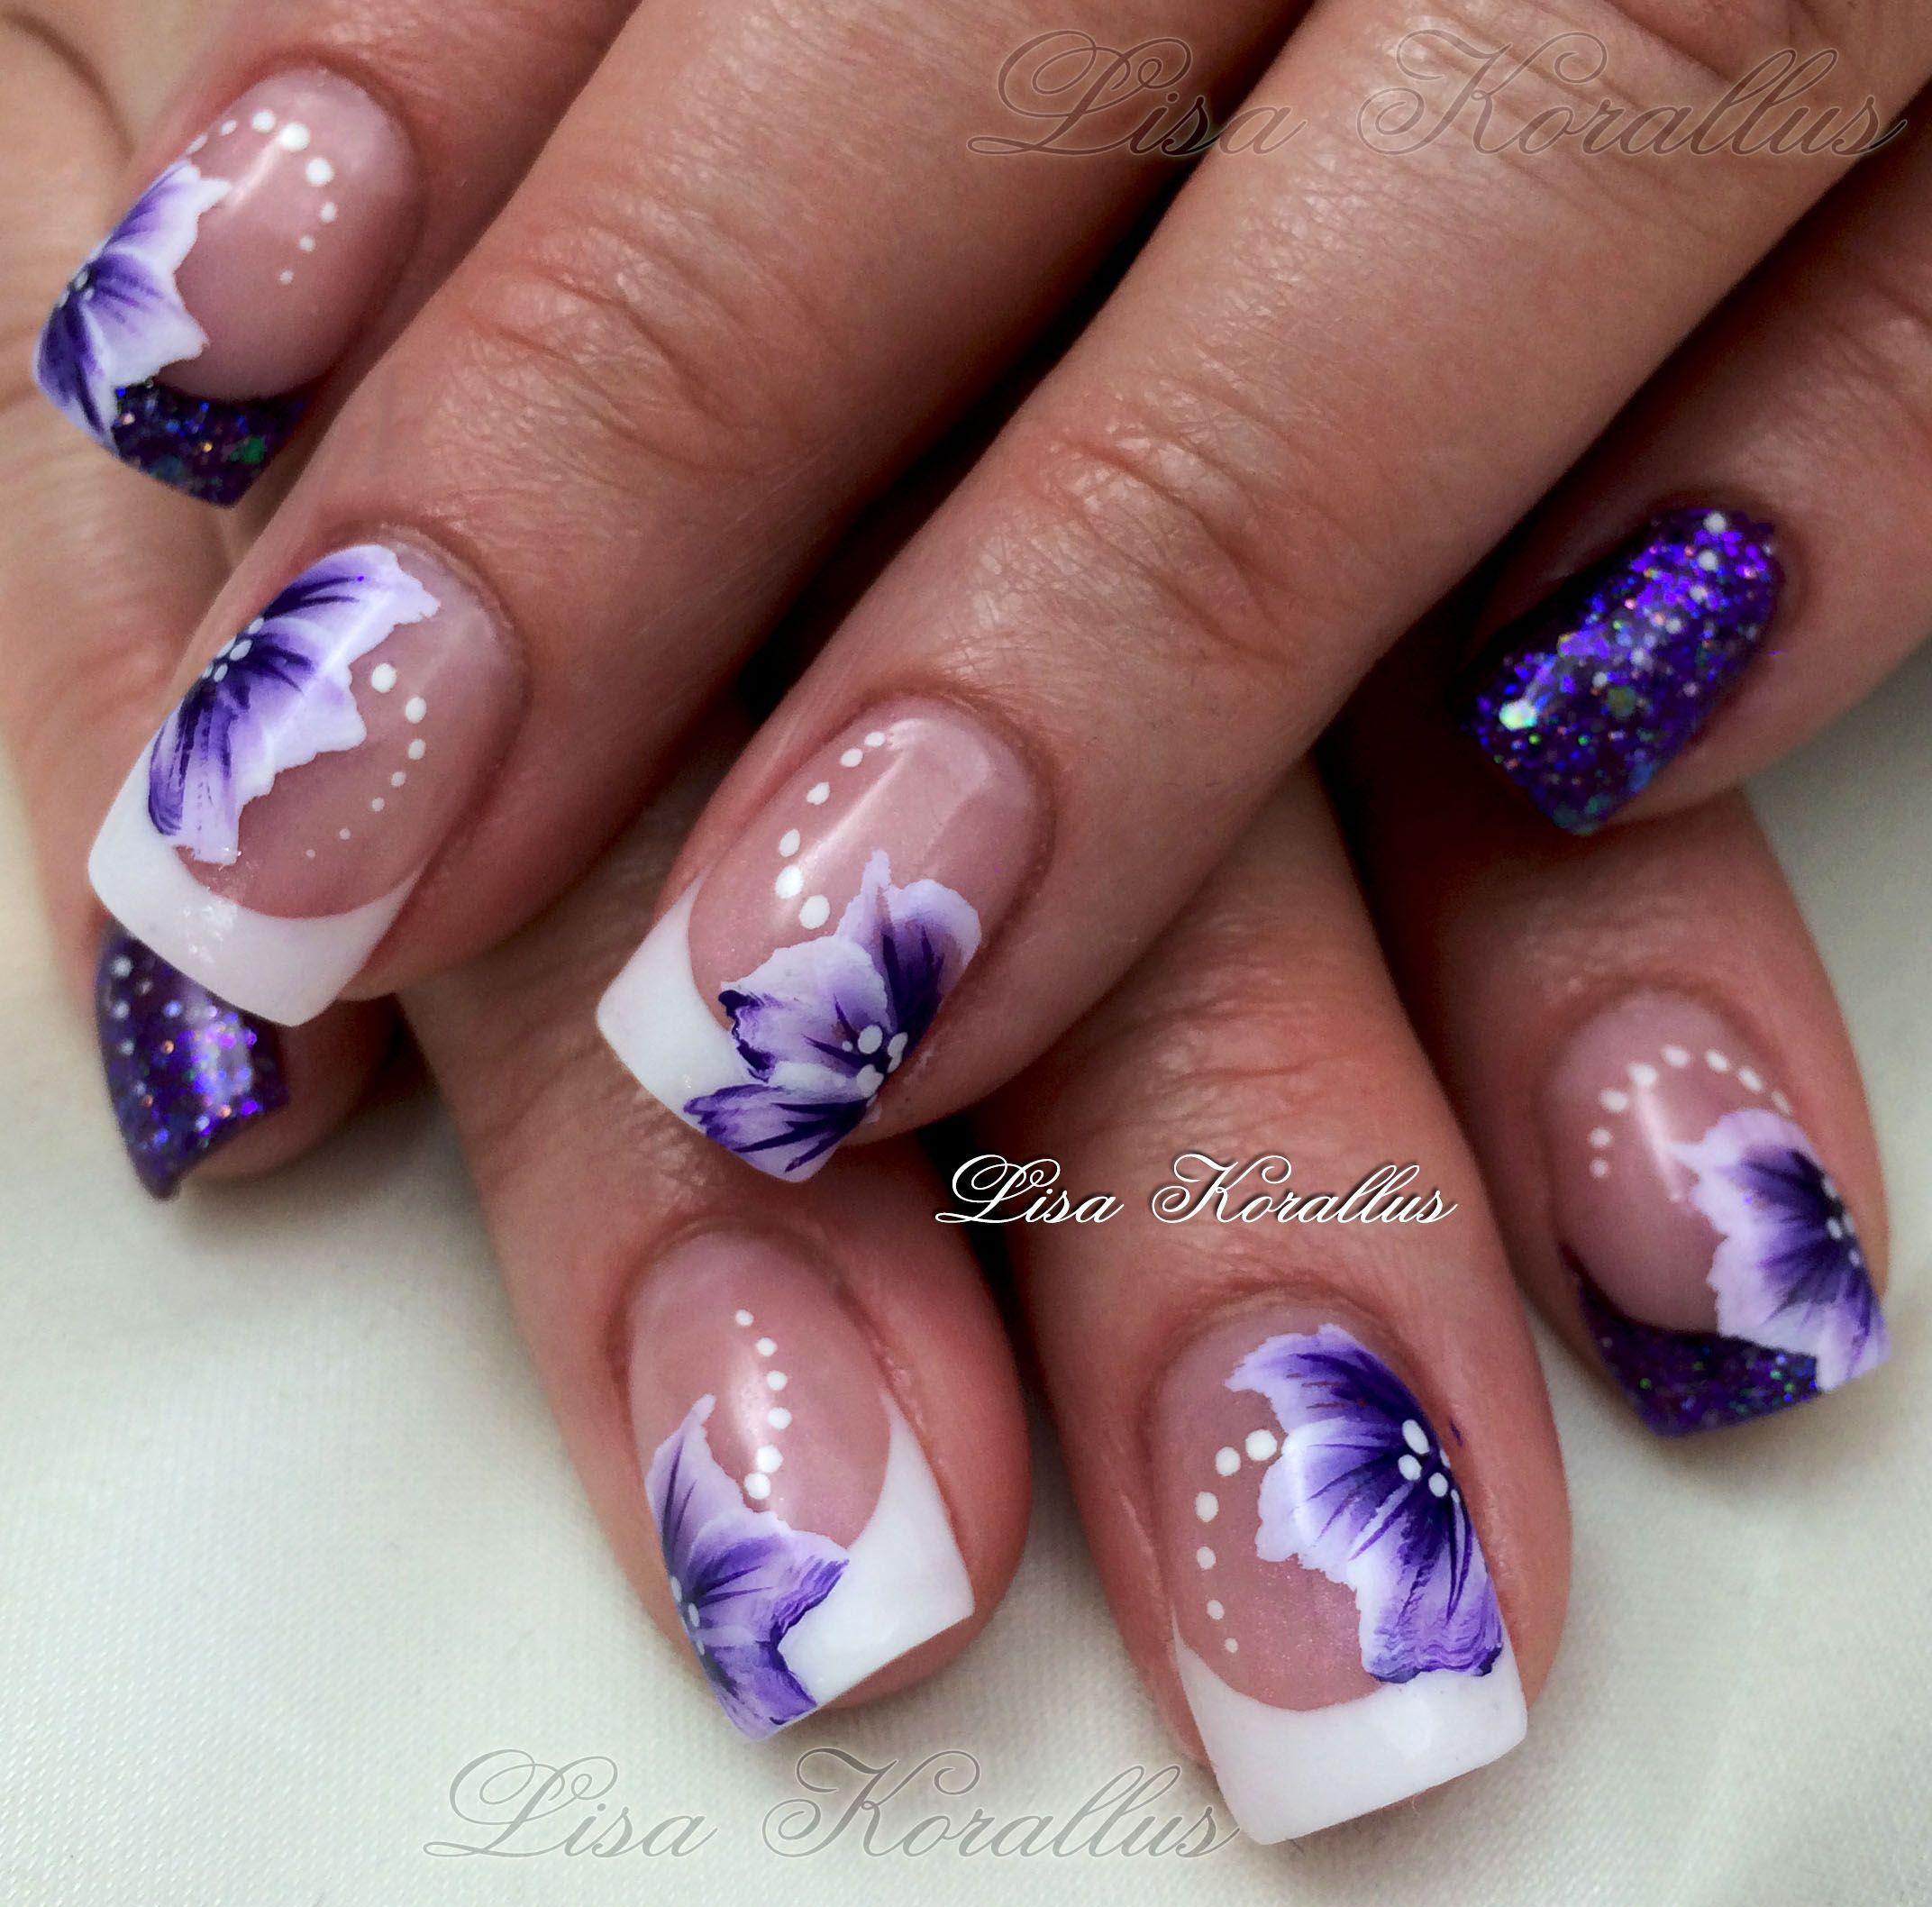 Haha Nails Hand Painted Butterfly Nail Art Floral Nails Butterfly Nail Art Pink Nails